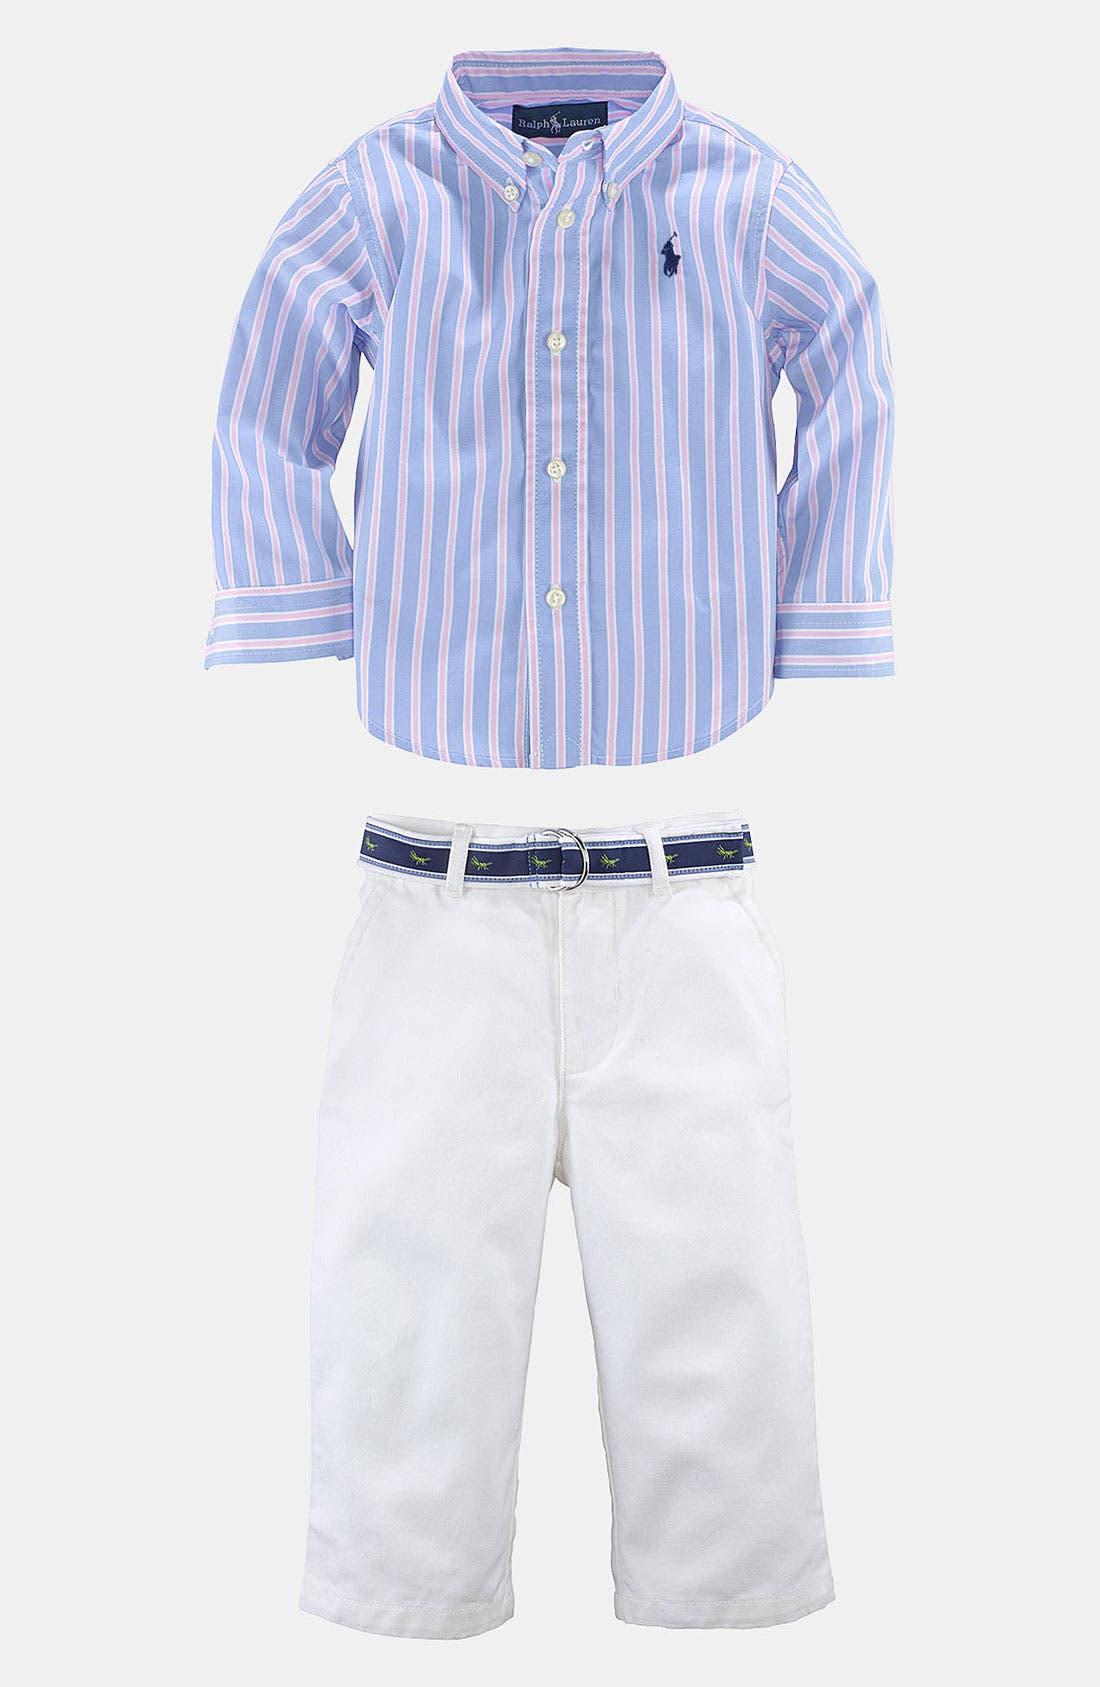 Main Image - Ralph Lauren Shirt & Pants (Baby)